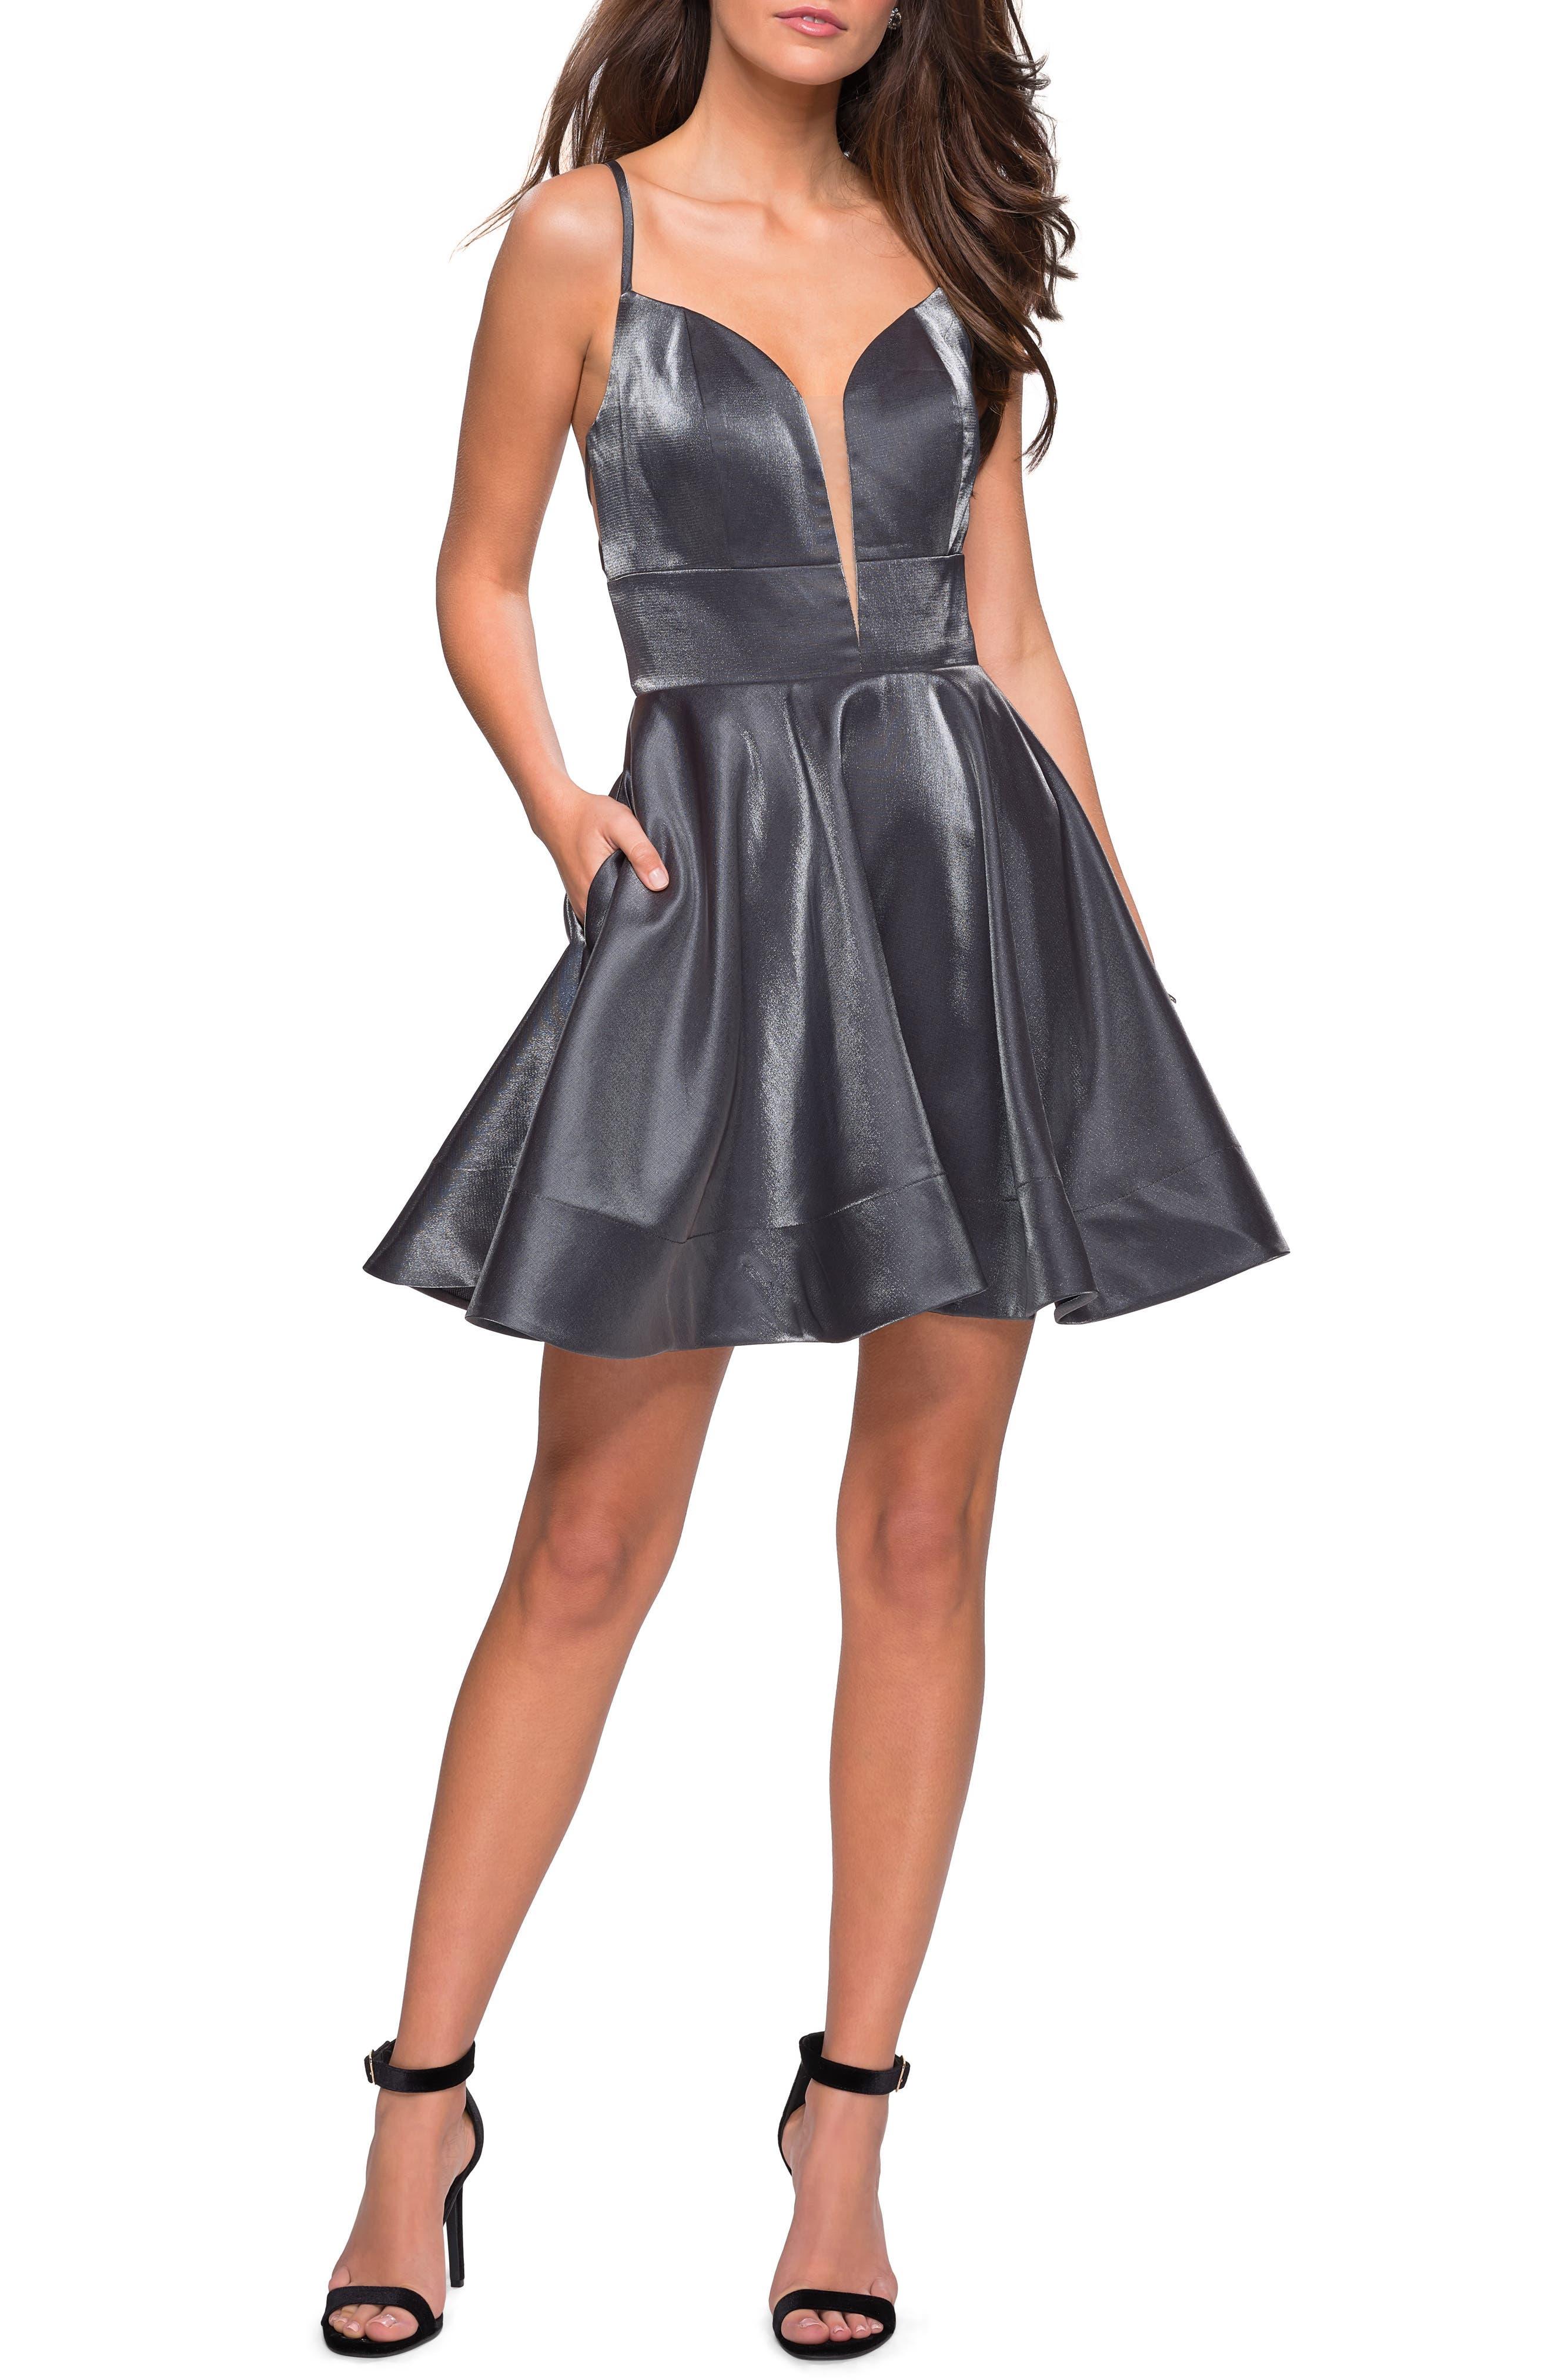 La Femme Satin Fit & Flare Dress, Grey